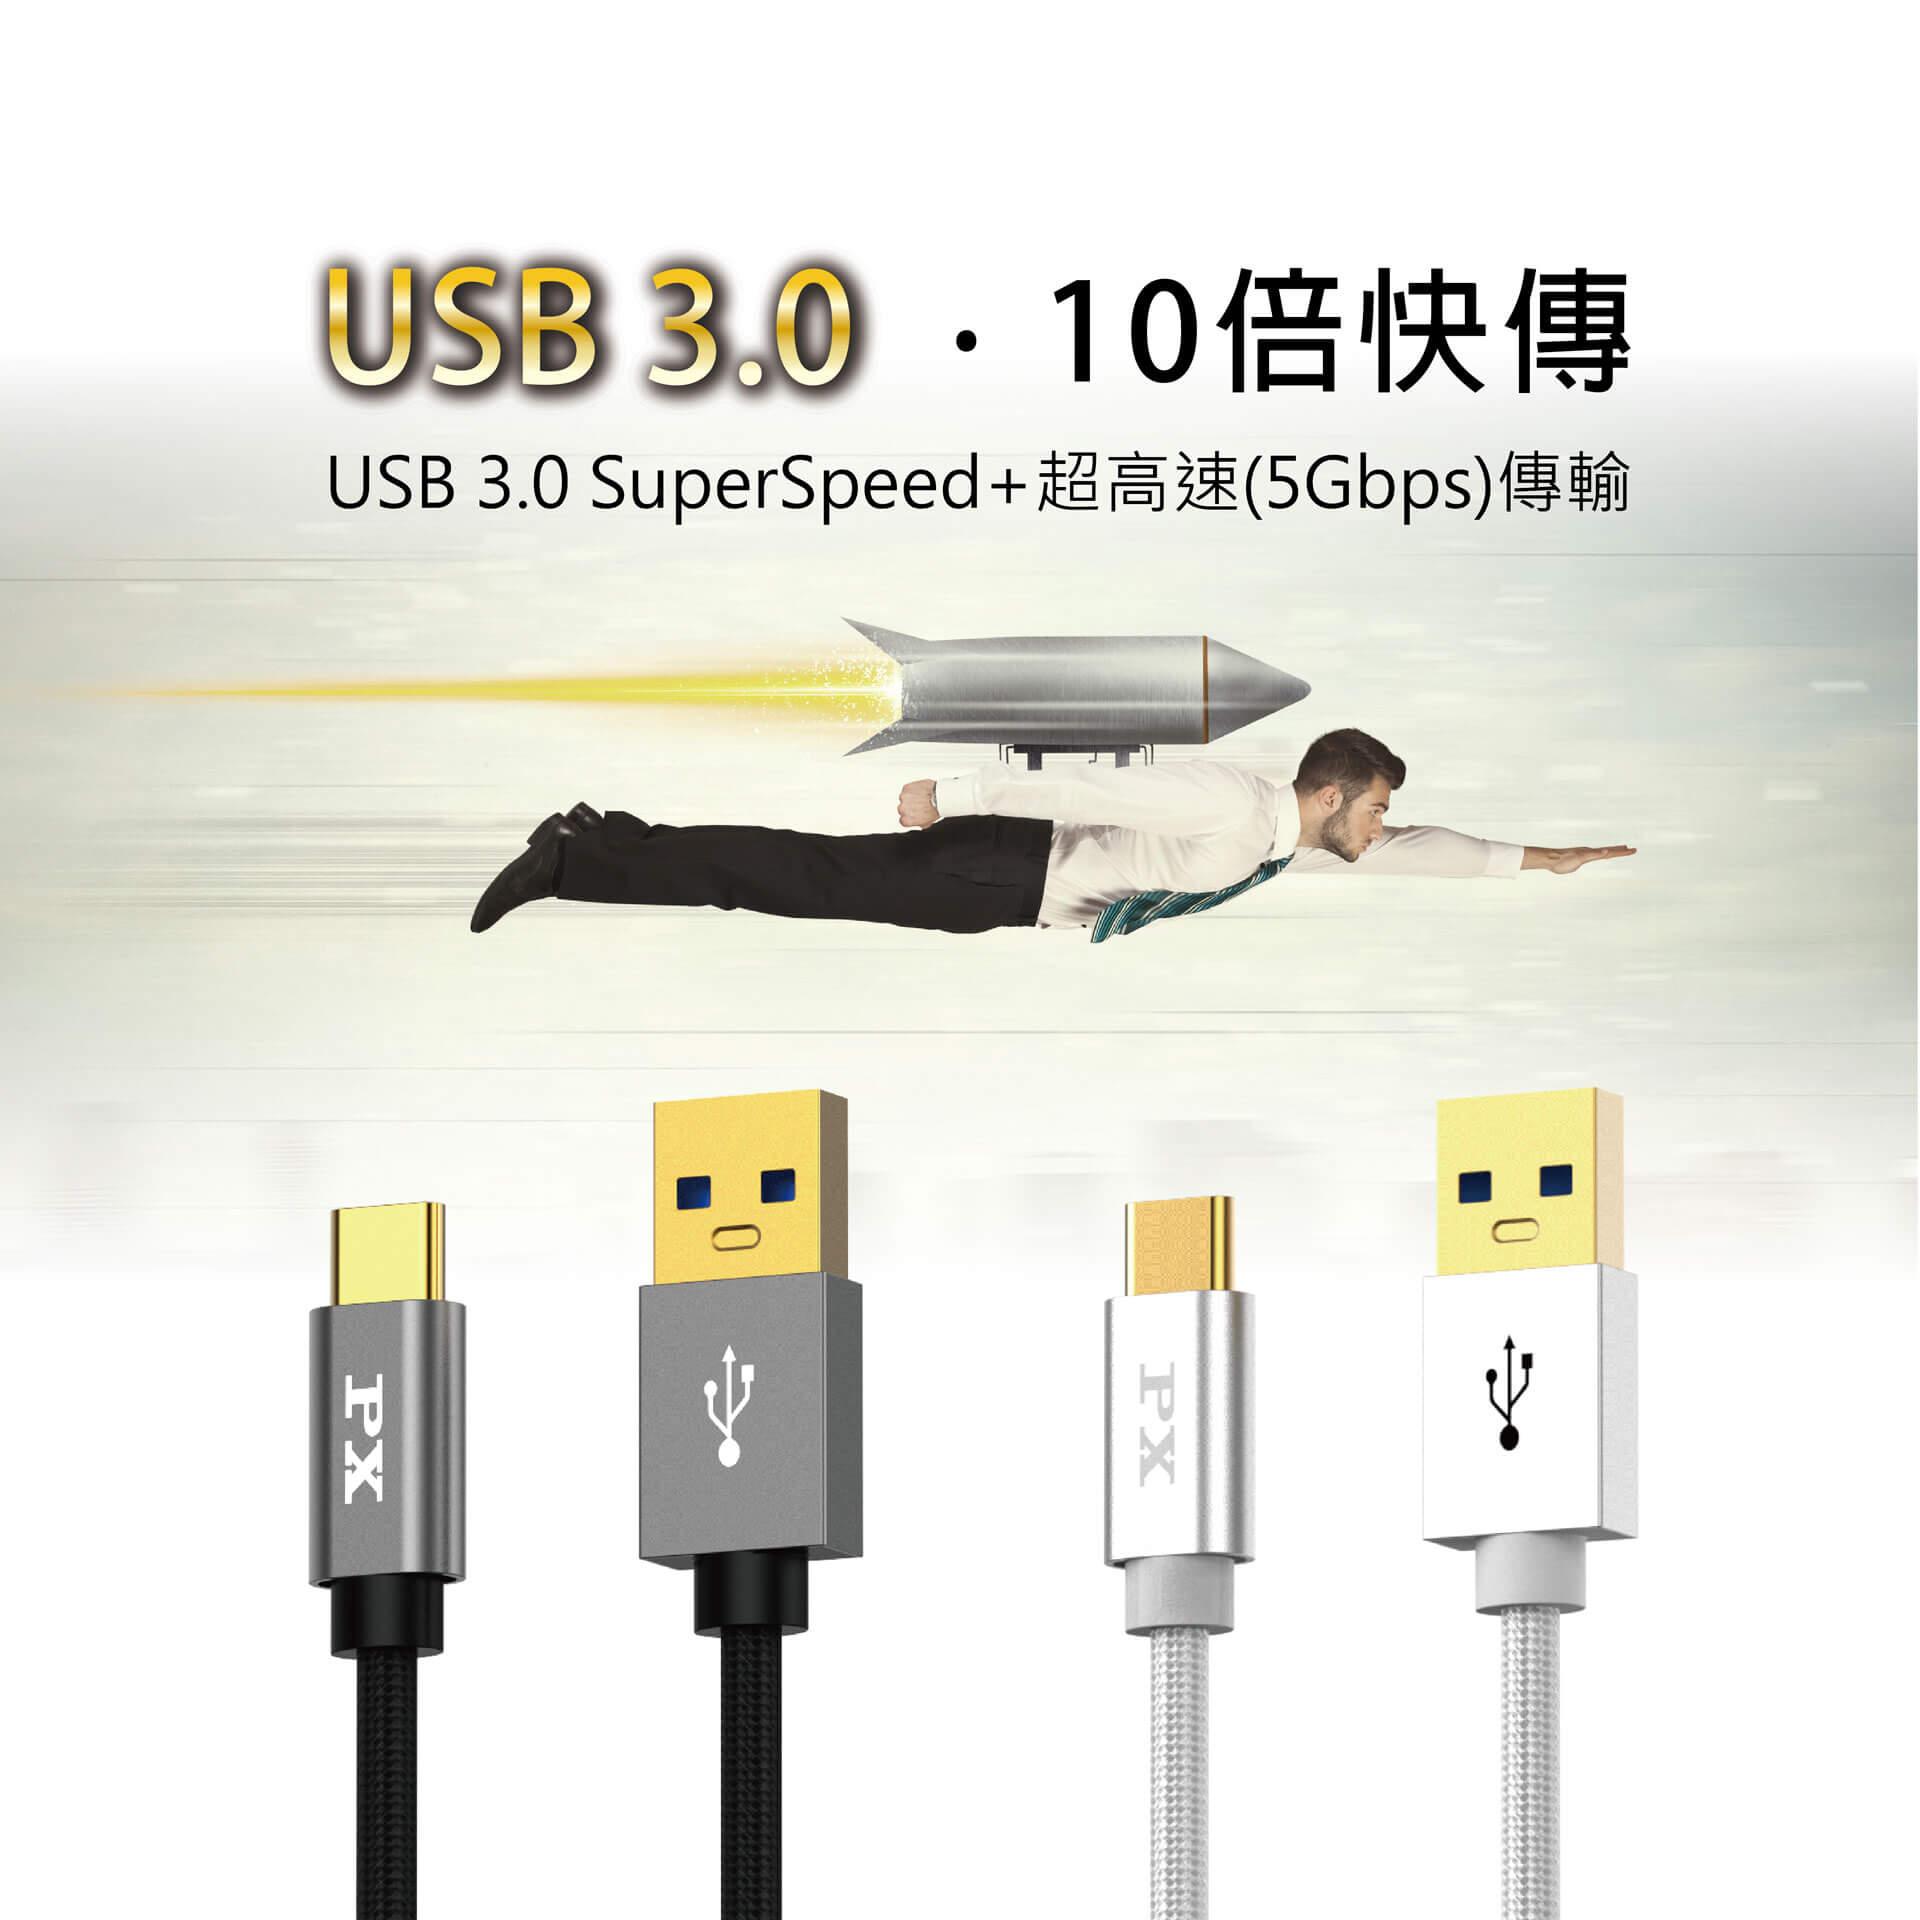 proimages/product/pro-02/pro02-001/UAC3-1B/UAC3-1B-4.jpg